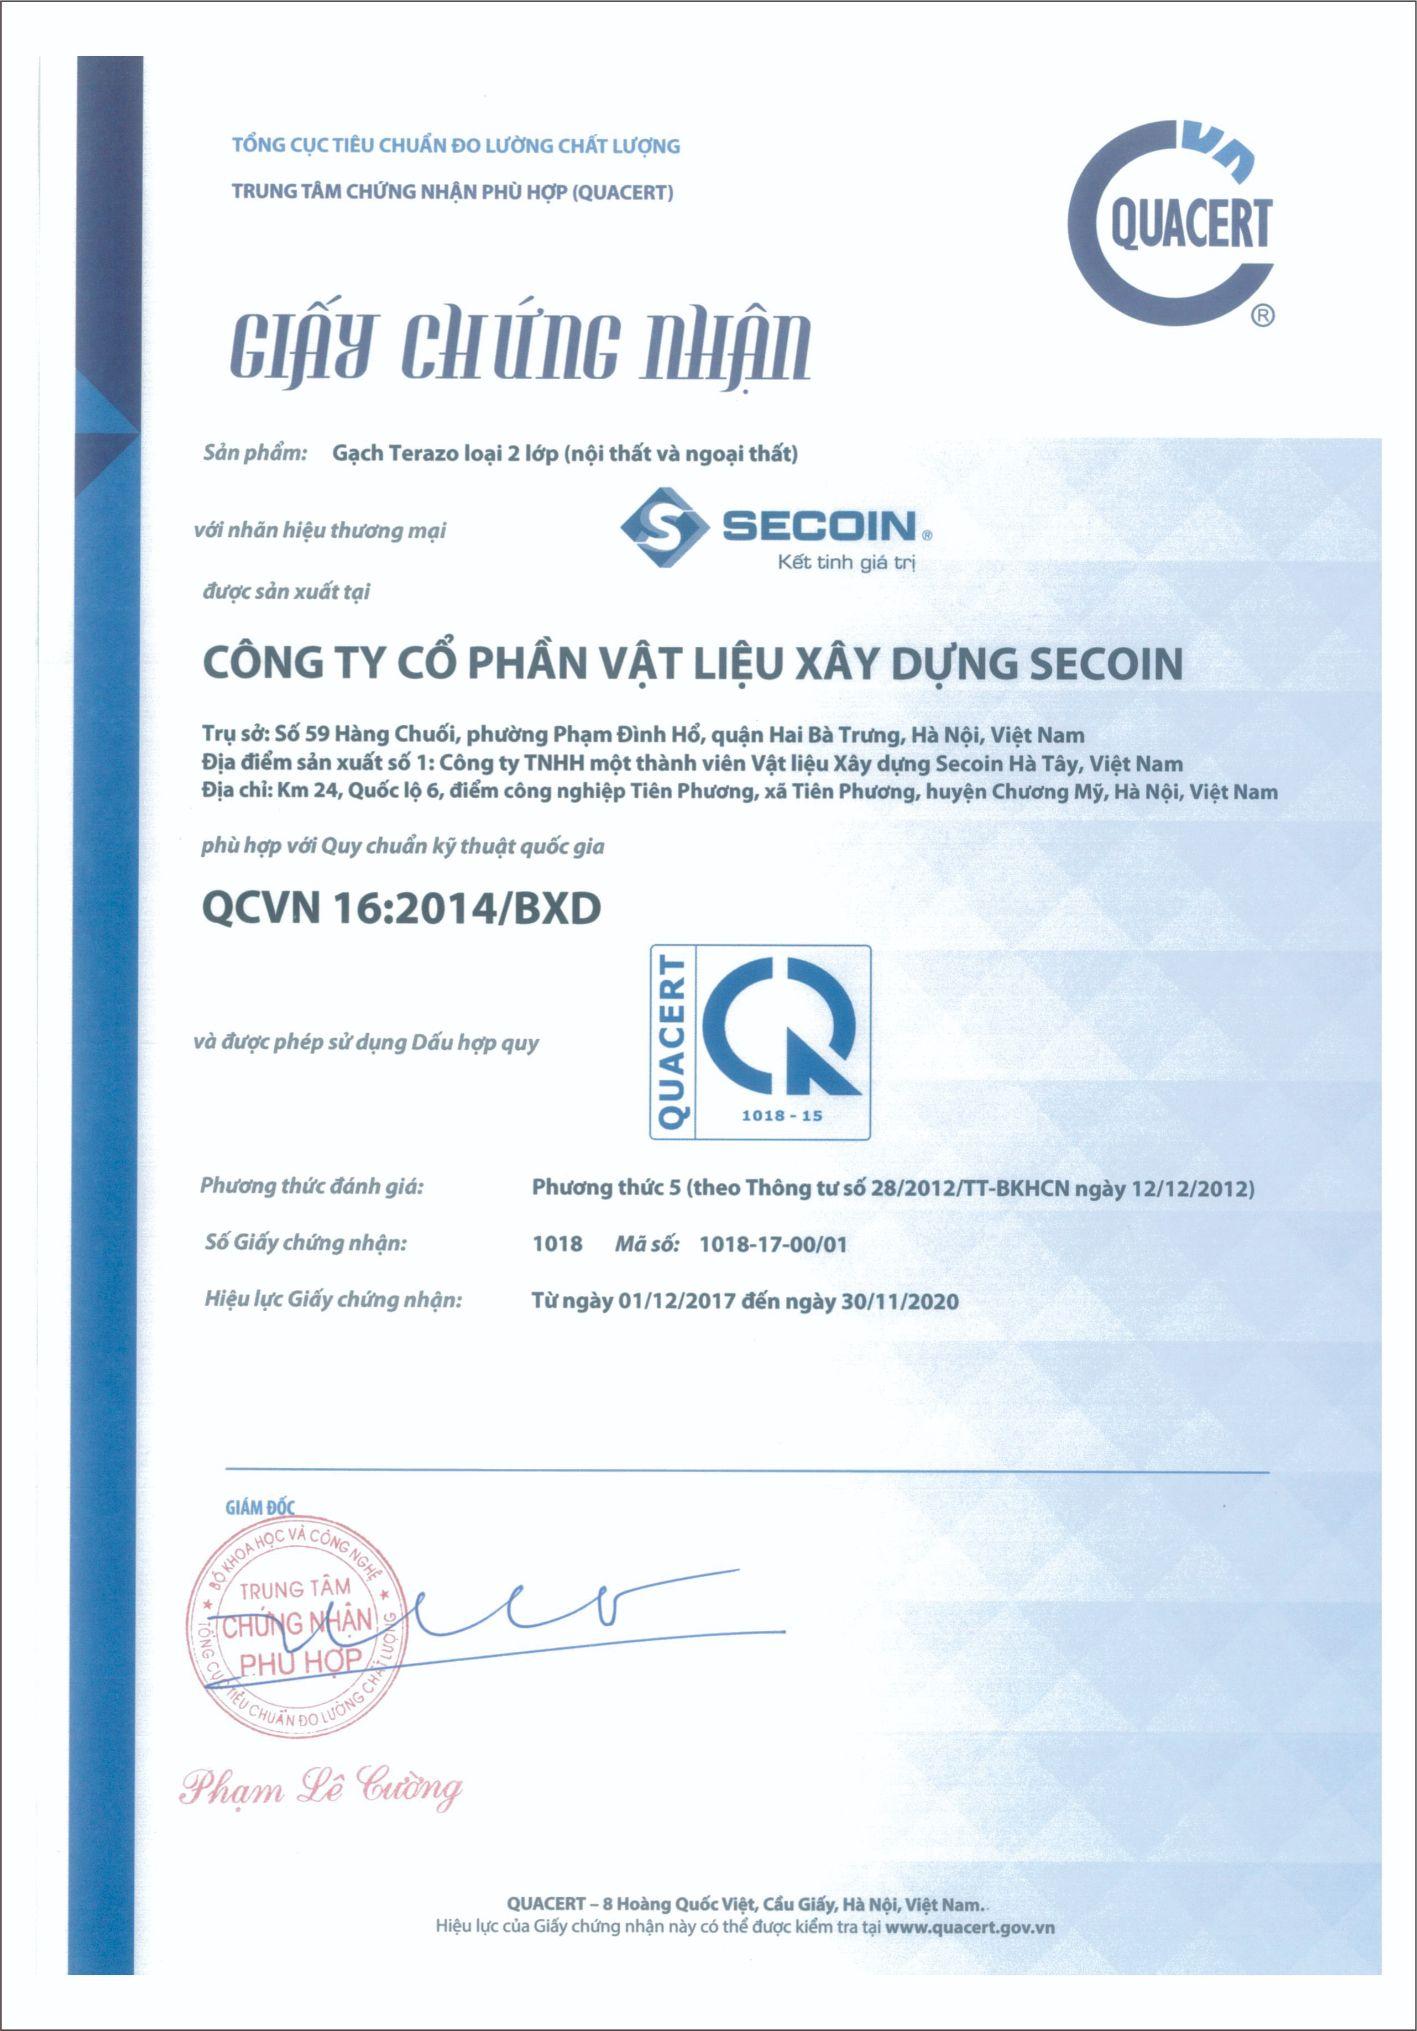 Secoin_HN___GCN_hop_qui_gach_Terrazzo